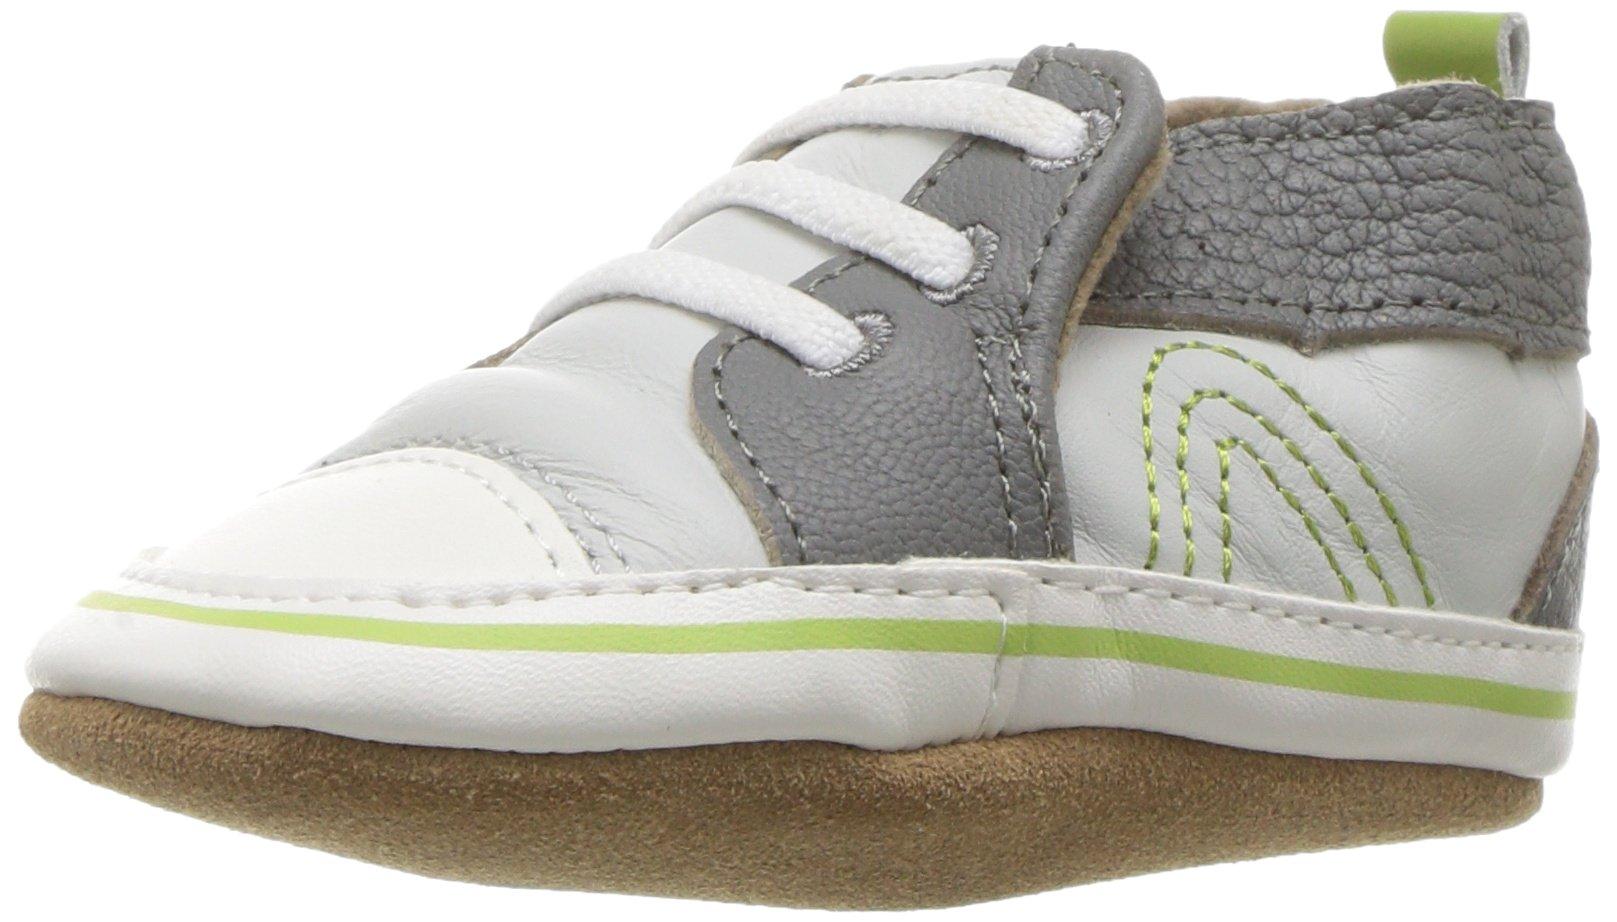 Robeez Boys' Soft Soles Crib Shoe, Grey, 12-18 Months M US Infant